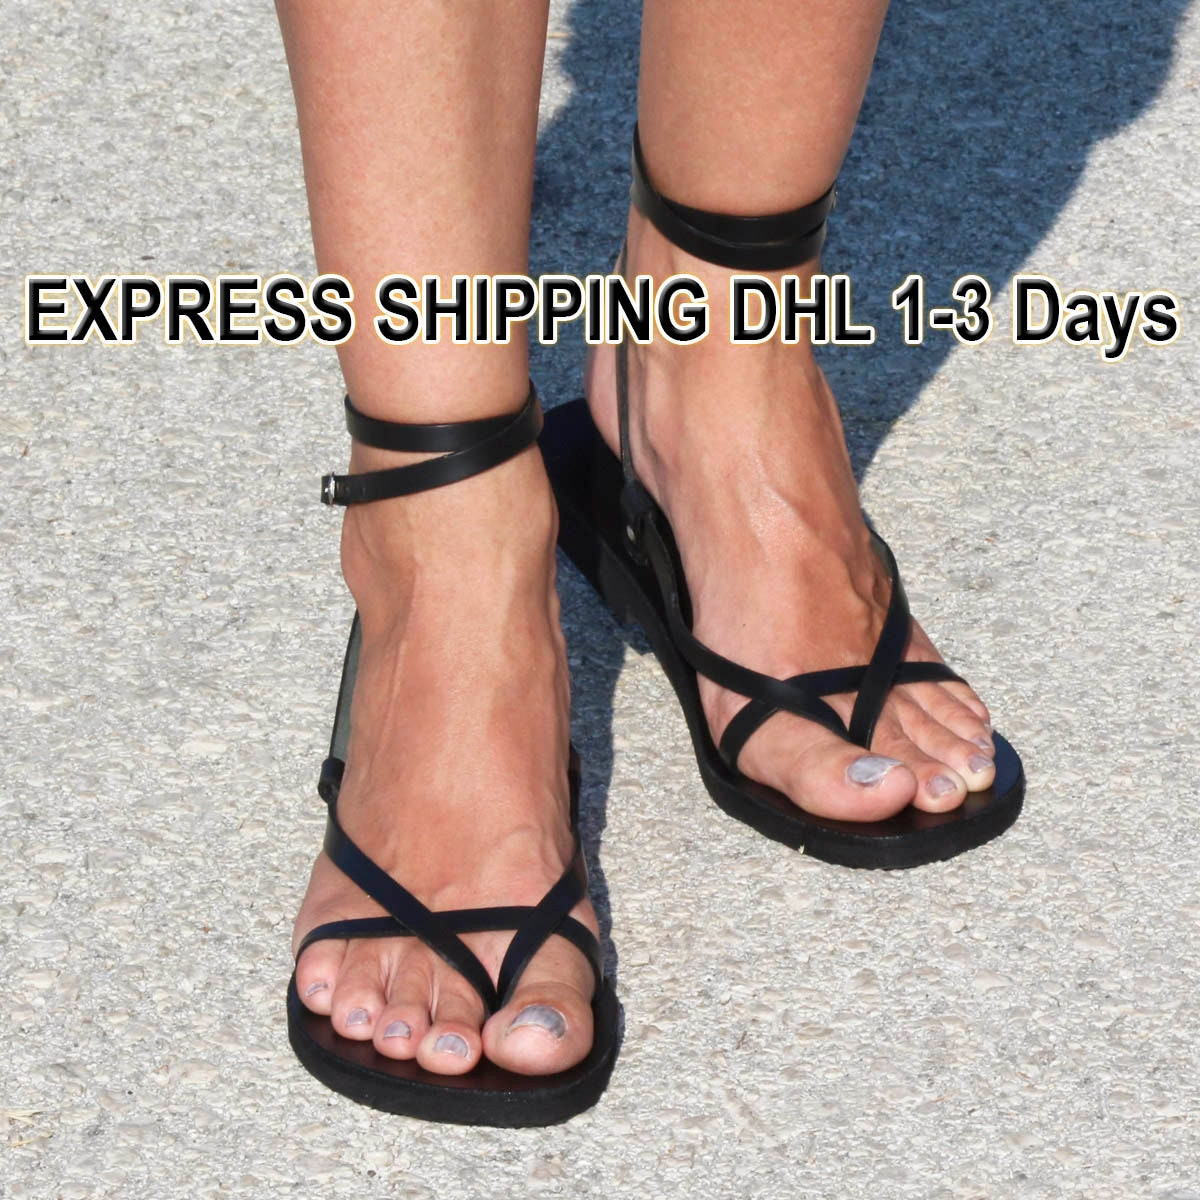 SUNSHINE Leather sandals/ unisex sandals/ strappy sandals, ancient Greek sandals/ sexy shoes/ boho sandals/ double ankle strap